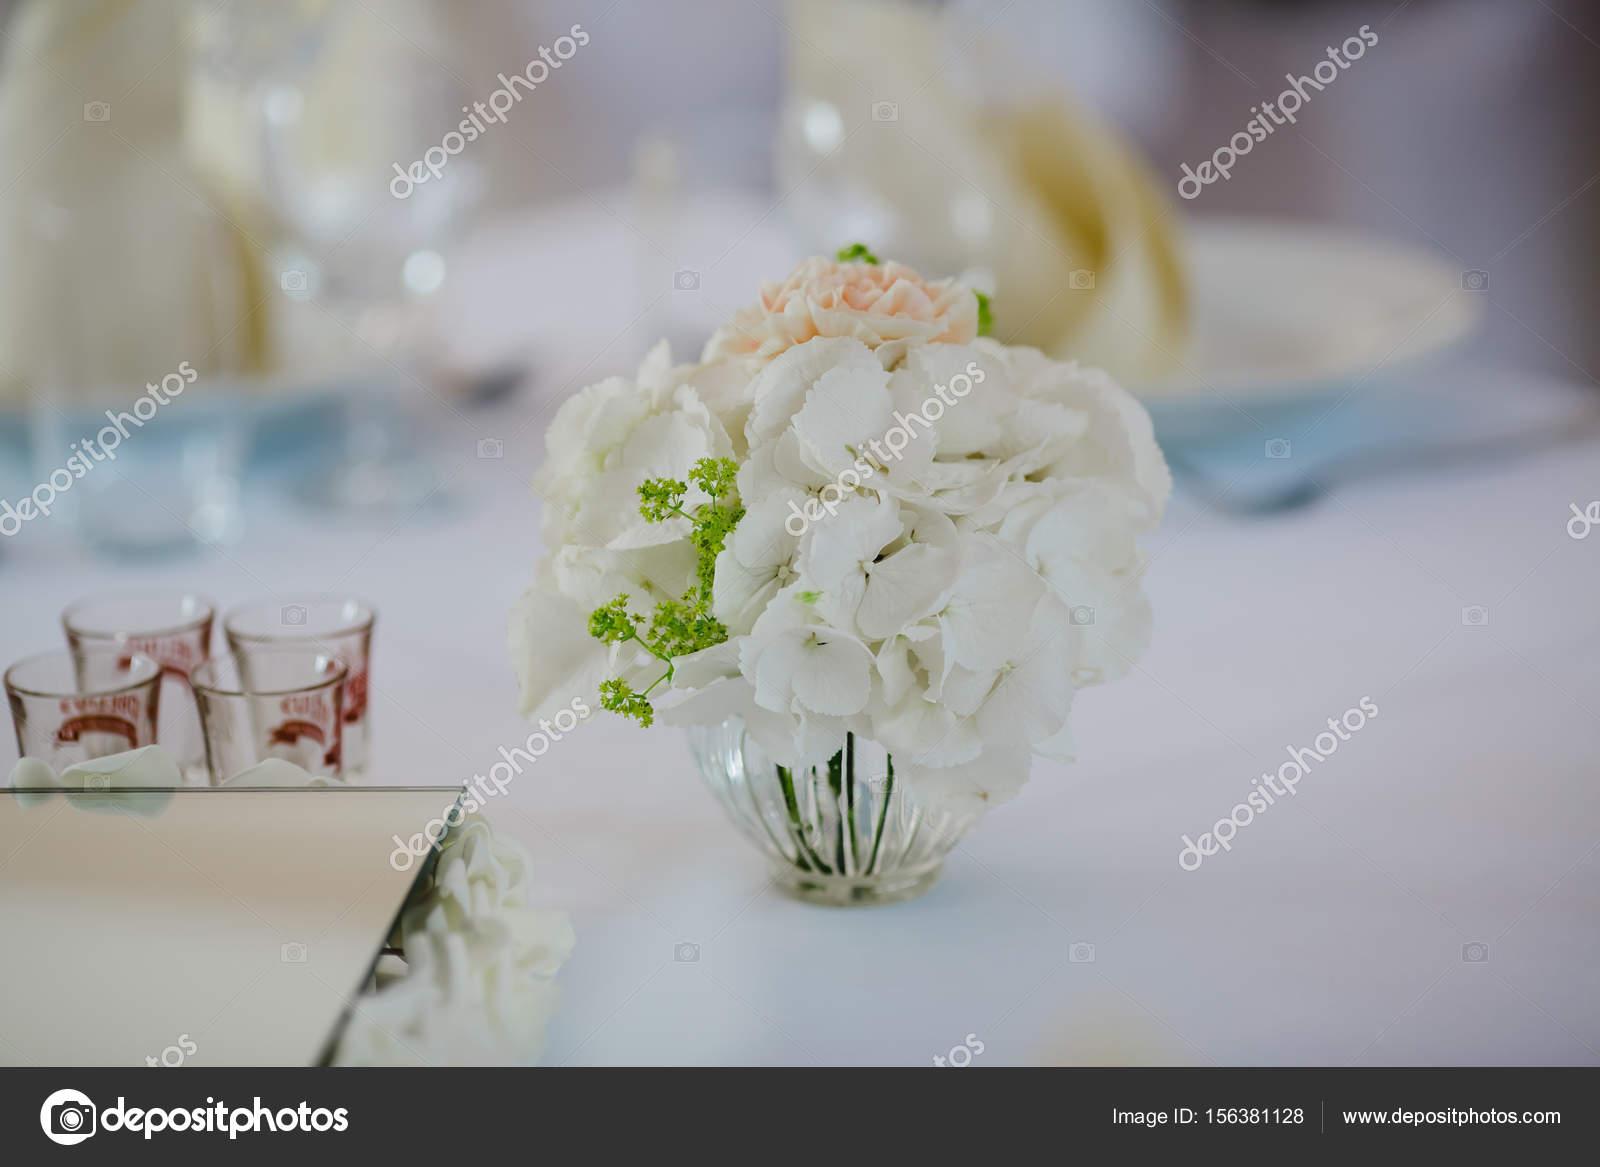 Hochzeit Dekoration Blumen Wand Stockfoto C Lelik83 156381128